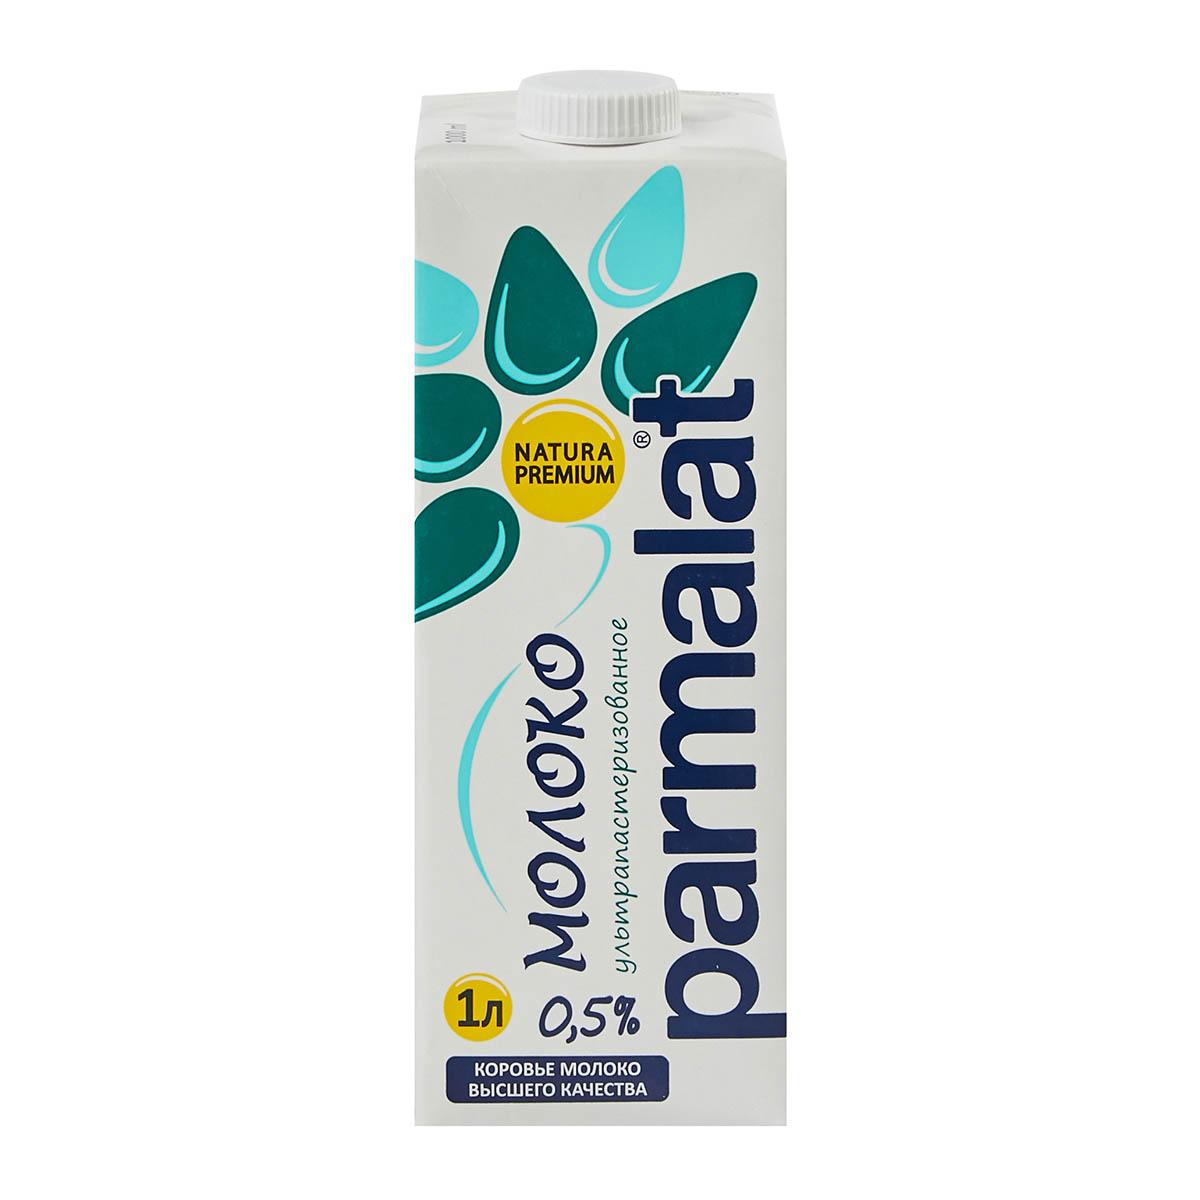 Parmalat 0,5%